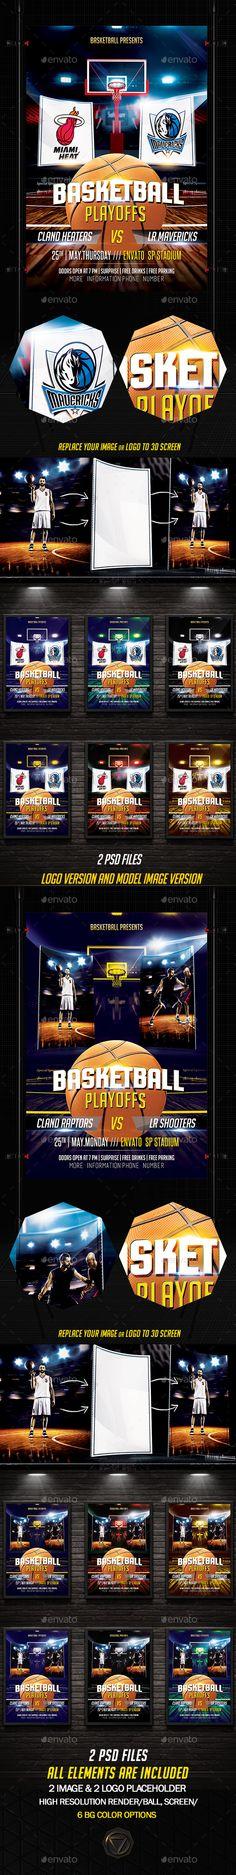 Basketball Playoffs Flyer Template PSD. Download here: http://graphicriver.net/item/basketball-playoffs/16103282?ref=ksioks